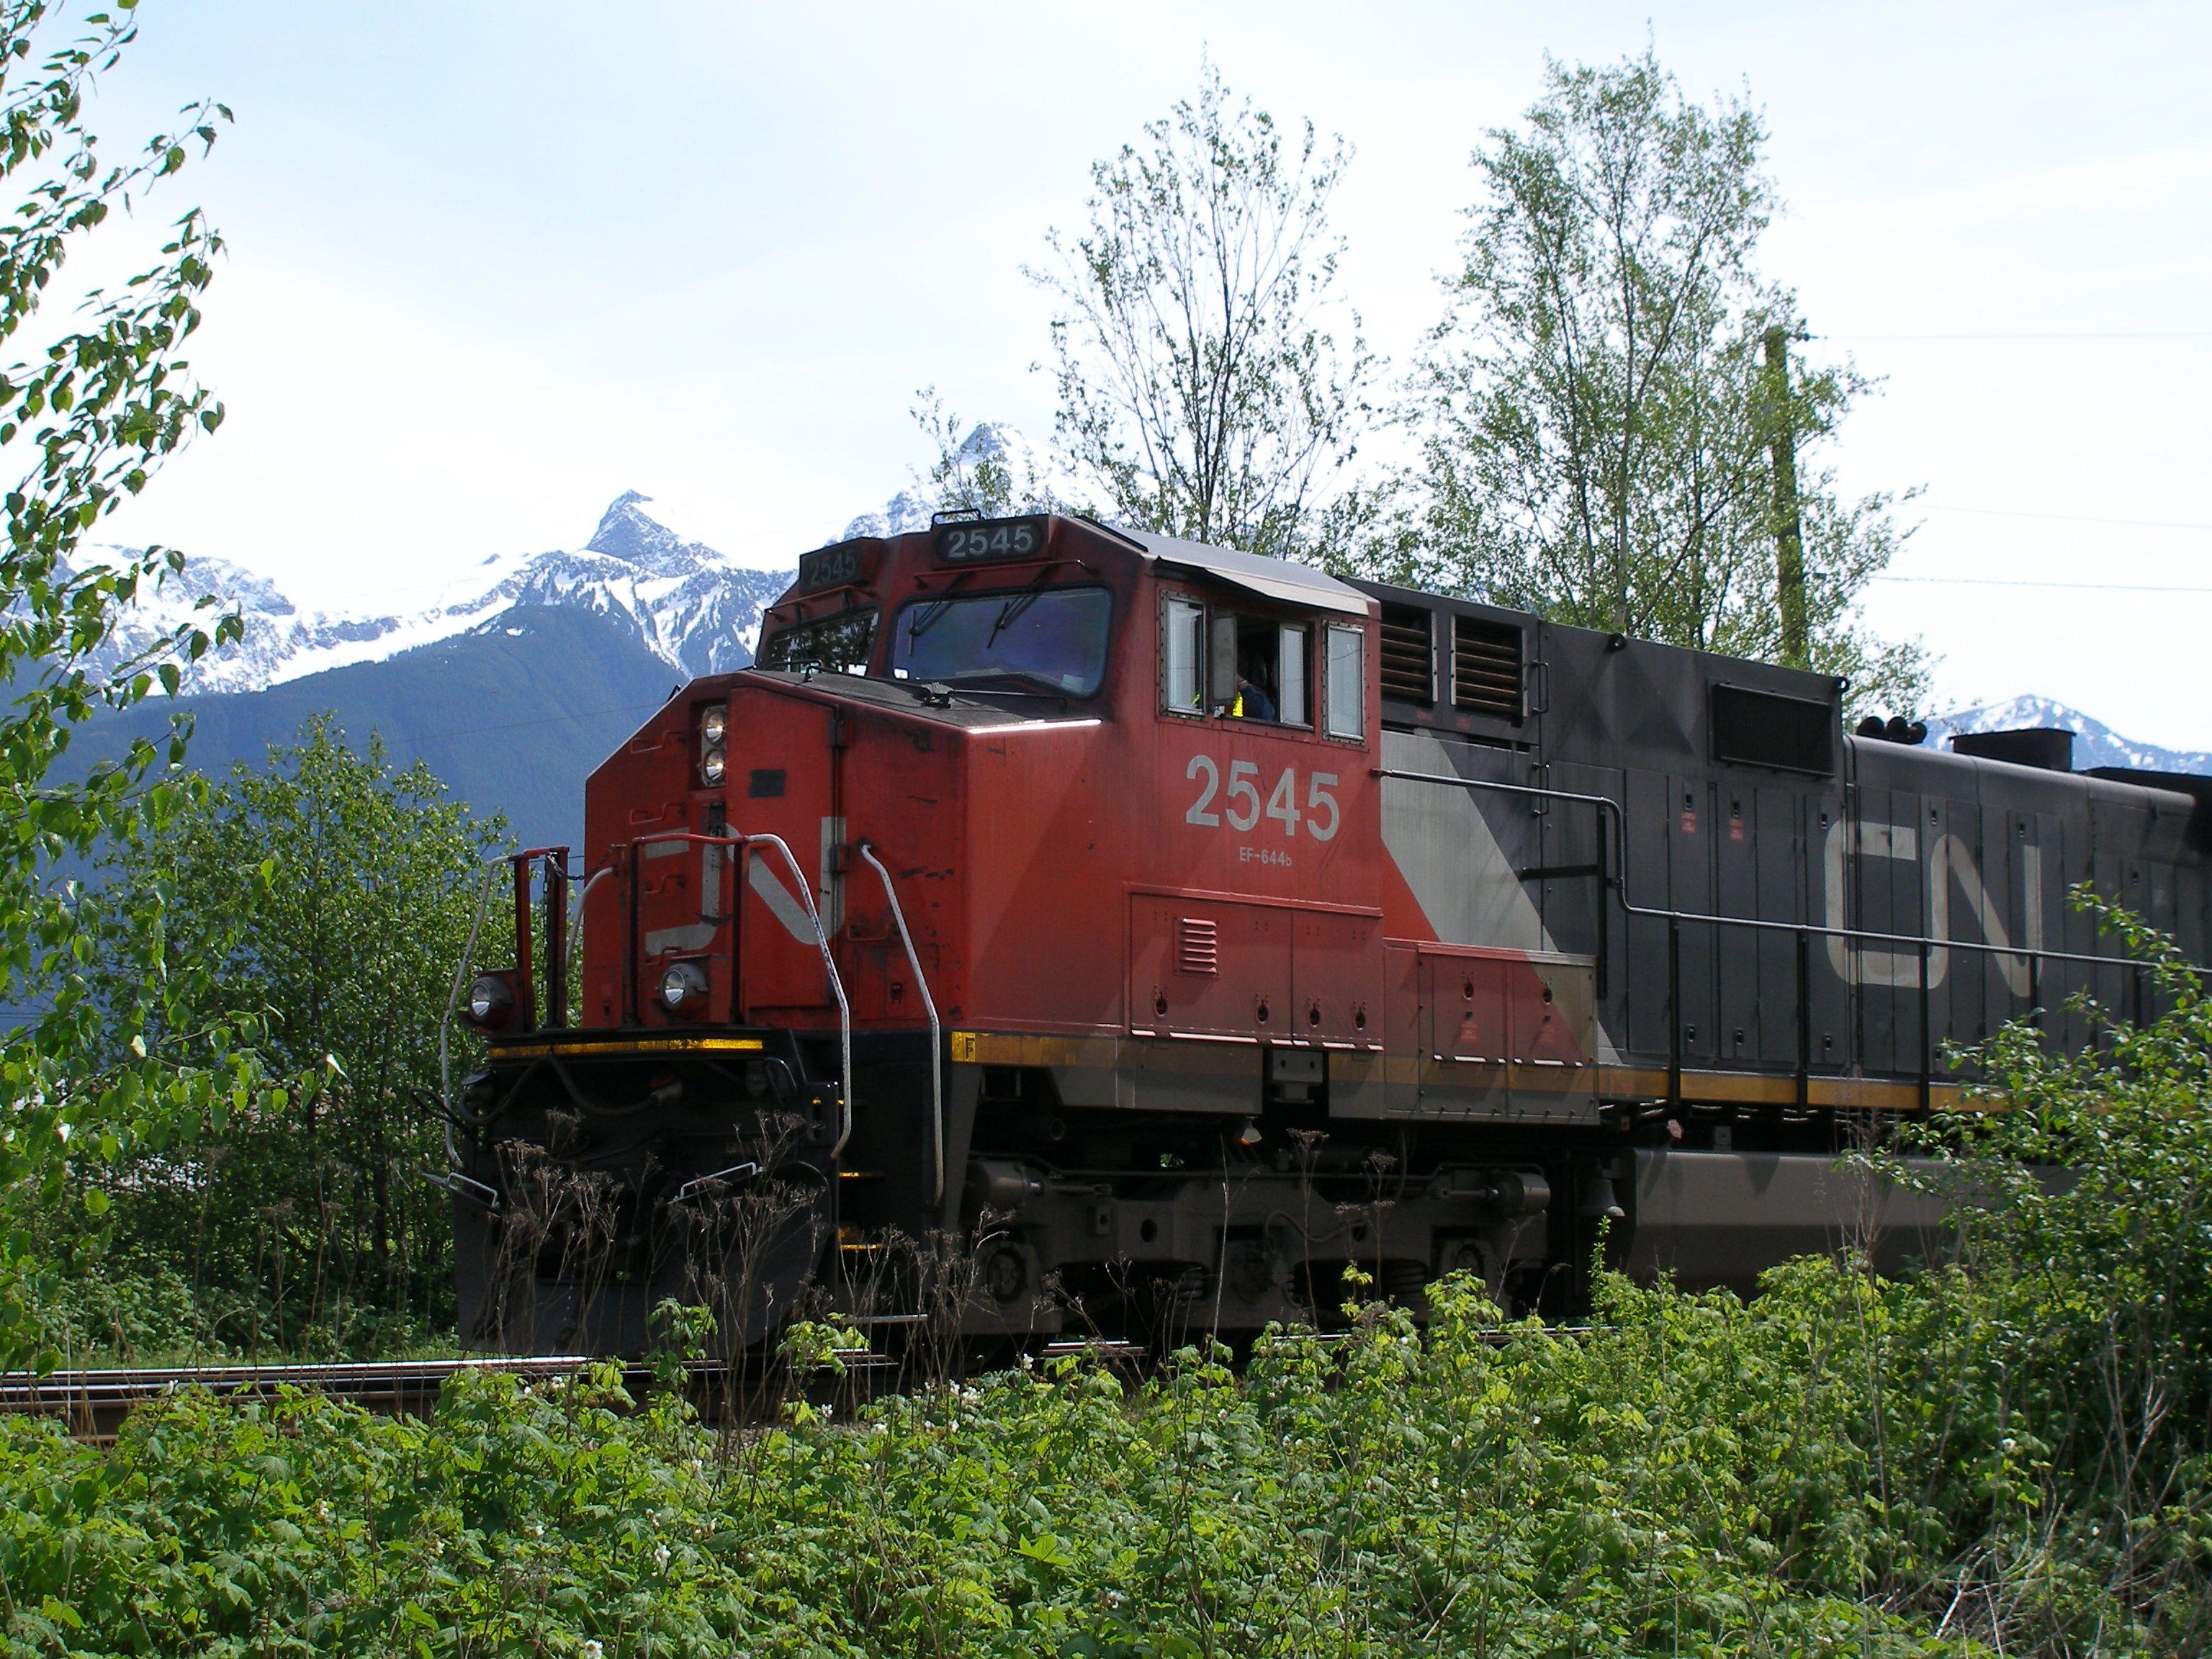 .. 2545 Canadian national railway, Train, Caboose